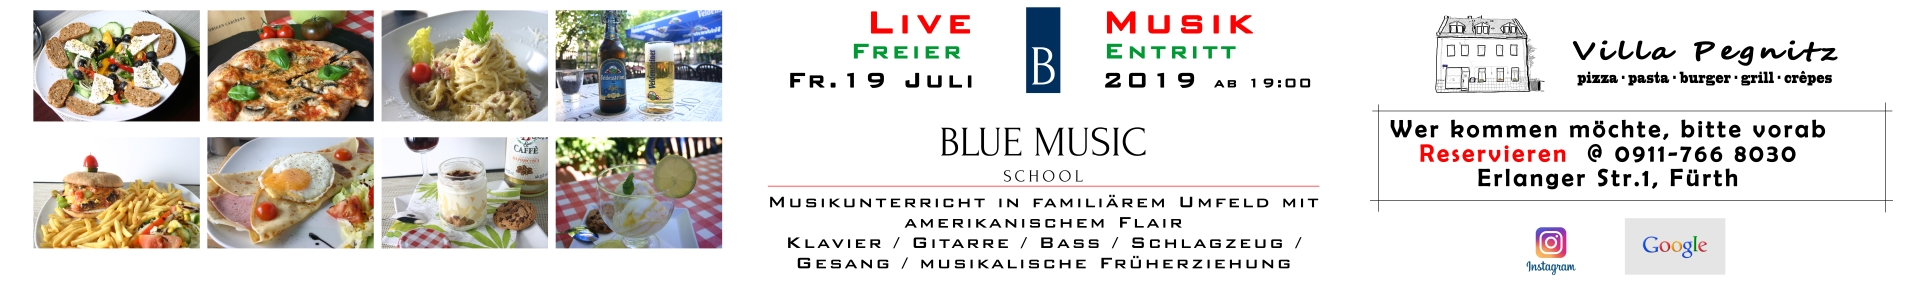 Blue Music School Konzert Villa Pegnitz